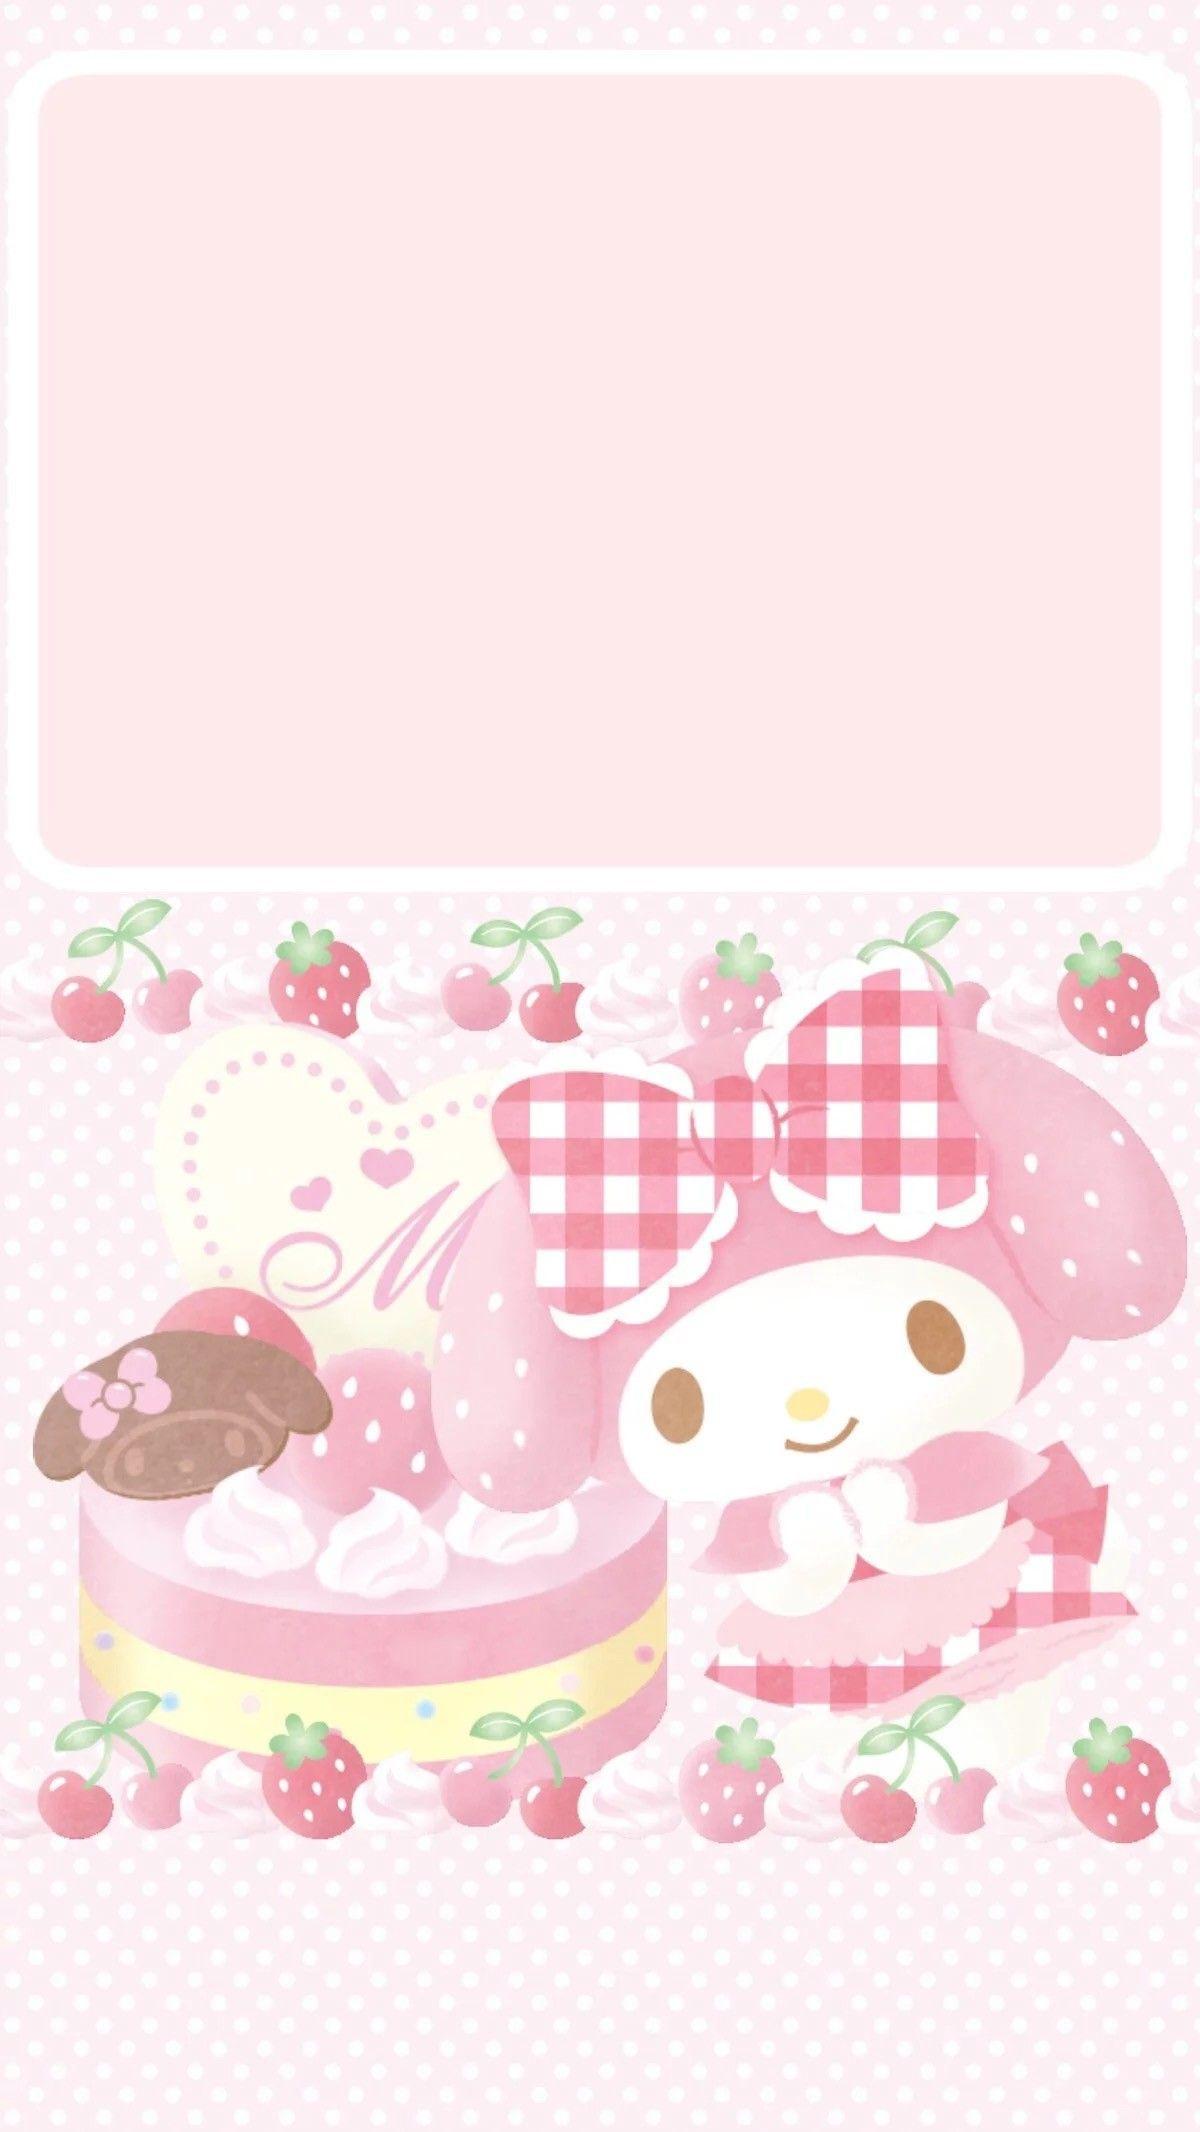 List Of Best Anime Wallpaper Iphone Pink 1200x2132 My Melody A Rilakkuma Wallpapersanrio Wal Anime Wallpaper Iphone Melody Wallpaper Pink Wallpaper Iphone Anime pink wallpaper iphone